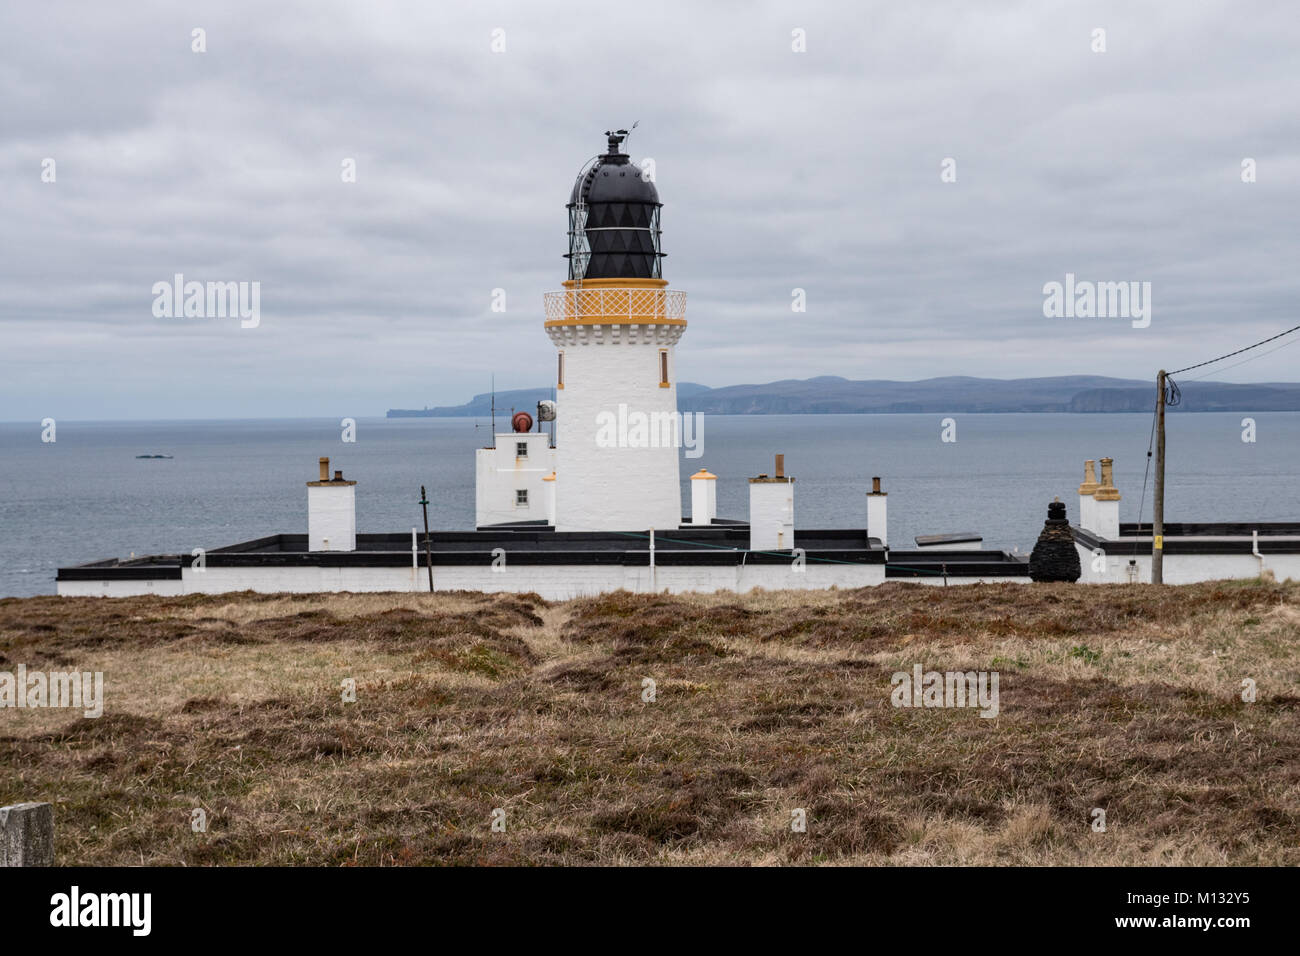 Dunnet Head lighthouse near Thurso, Caithness, Scotland. UK. - Stock Image